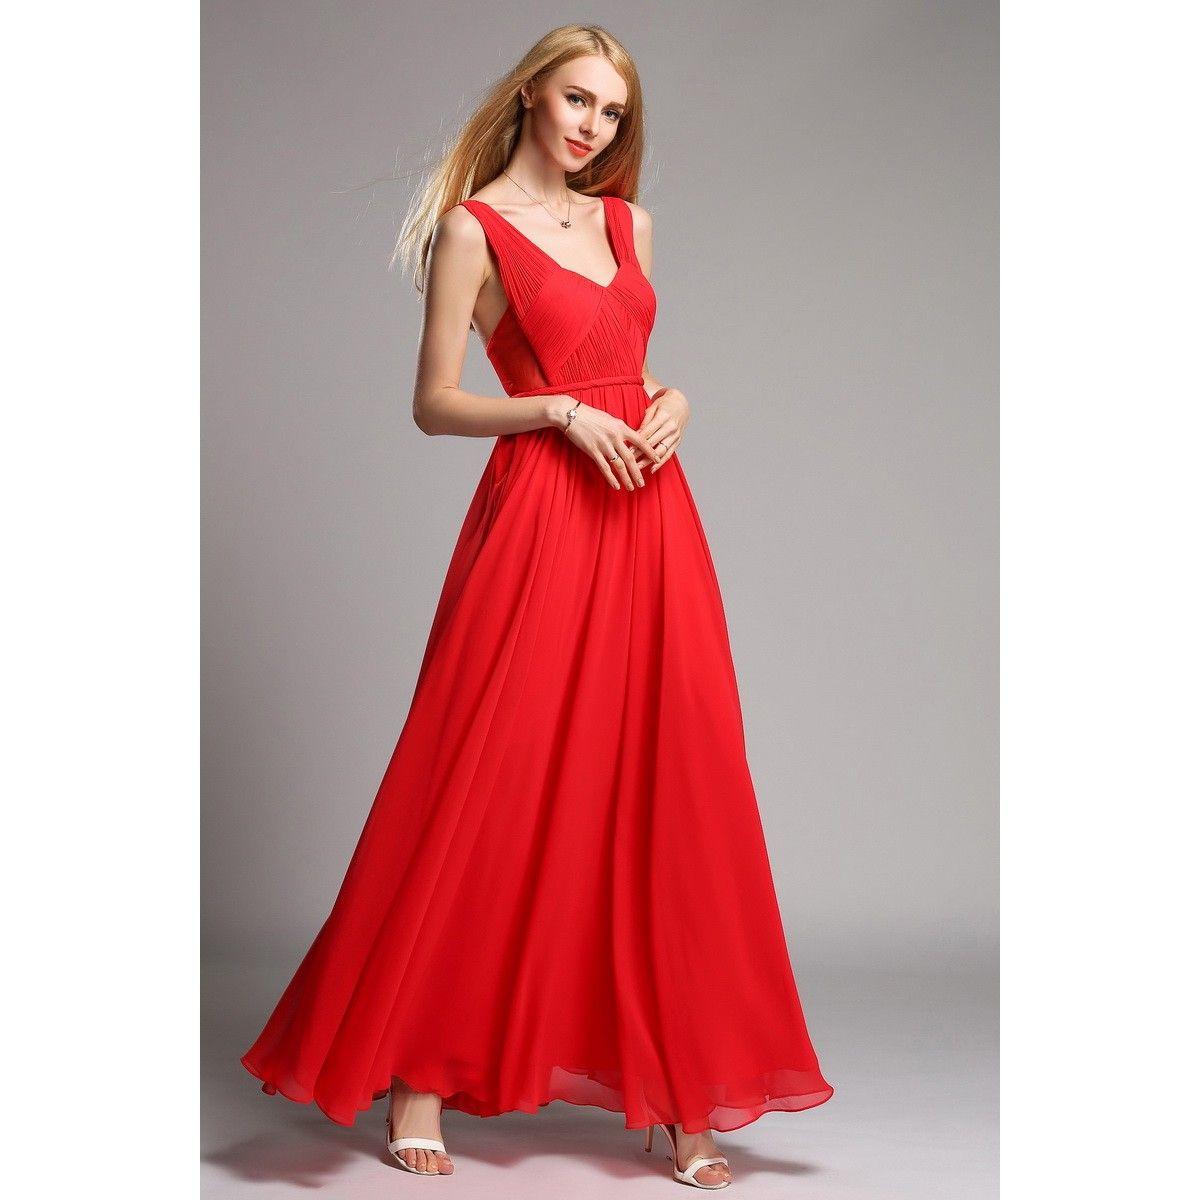 Open Back Celebrity Style Prom Dresses Mint Blue Chiffon Prom Dress